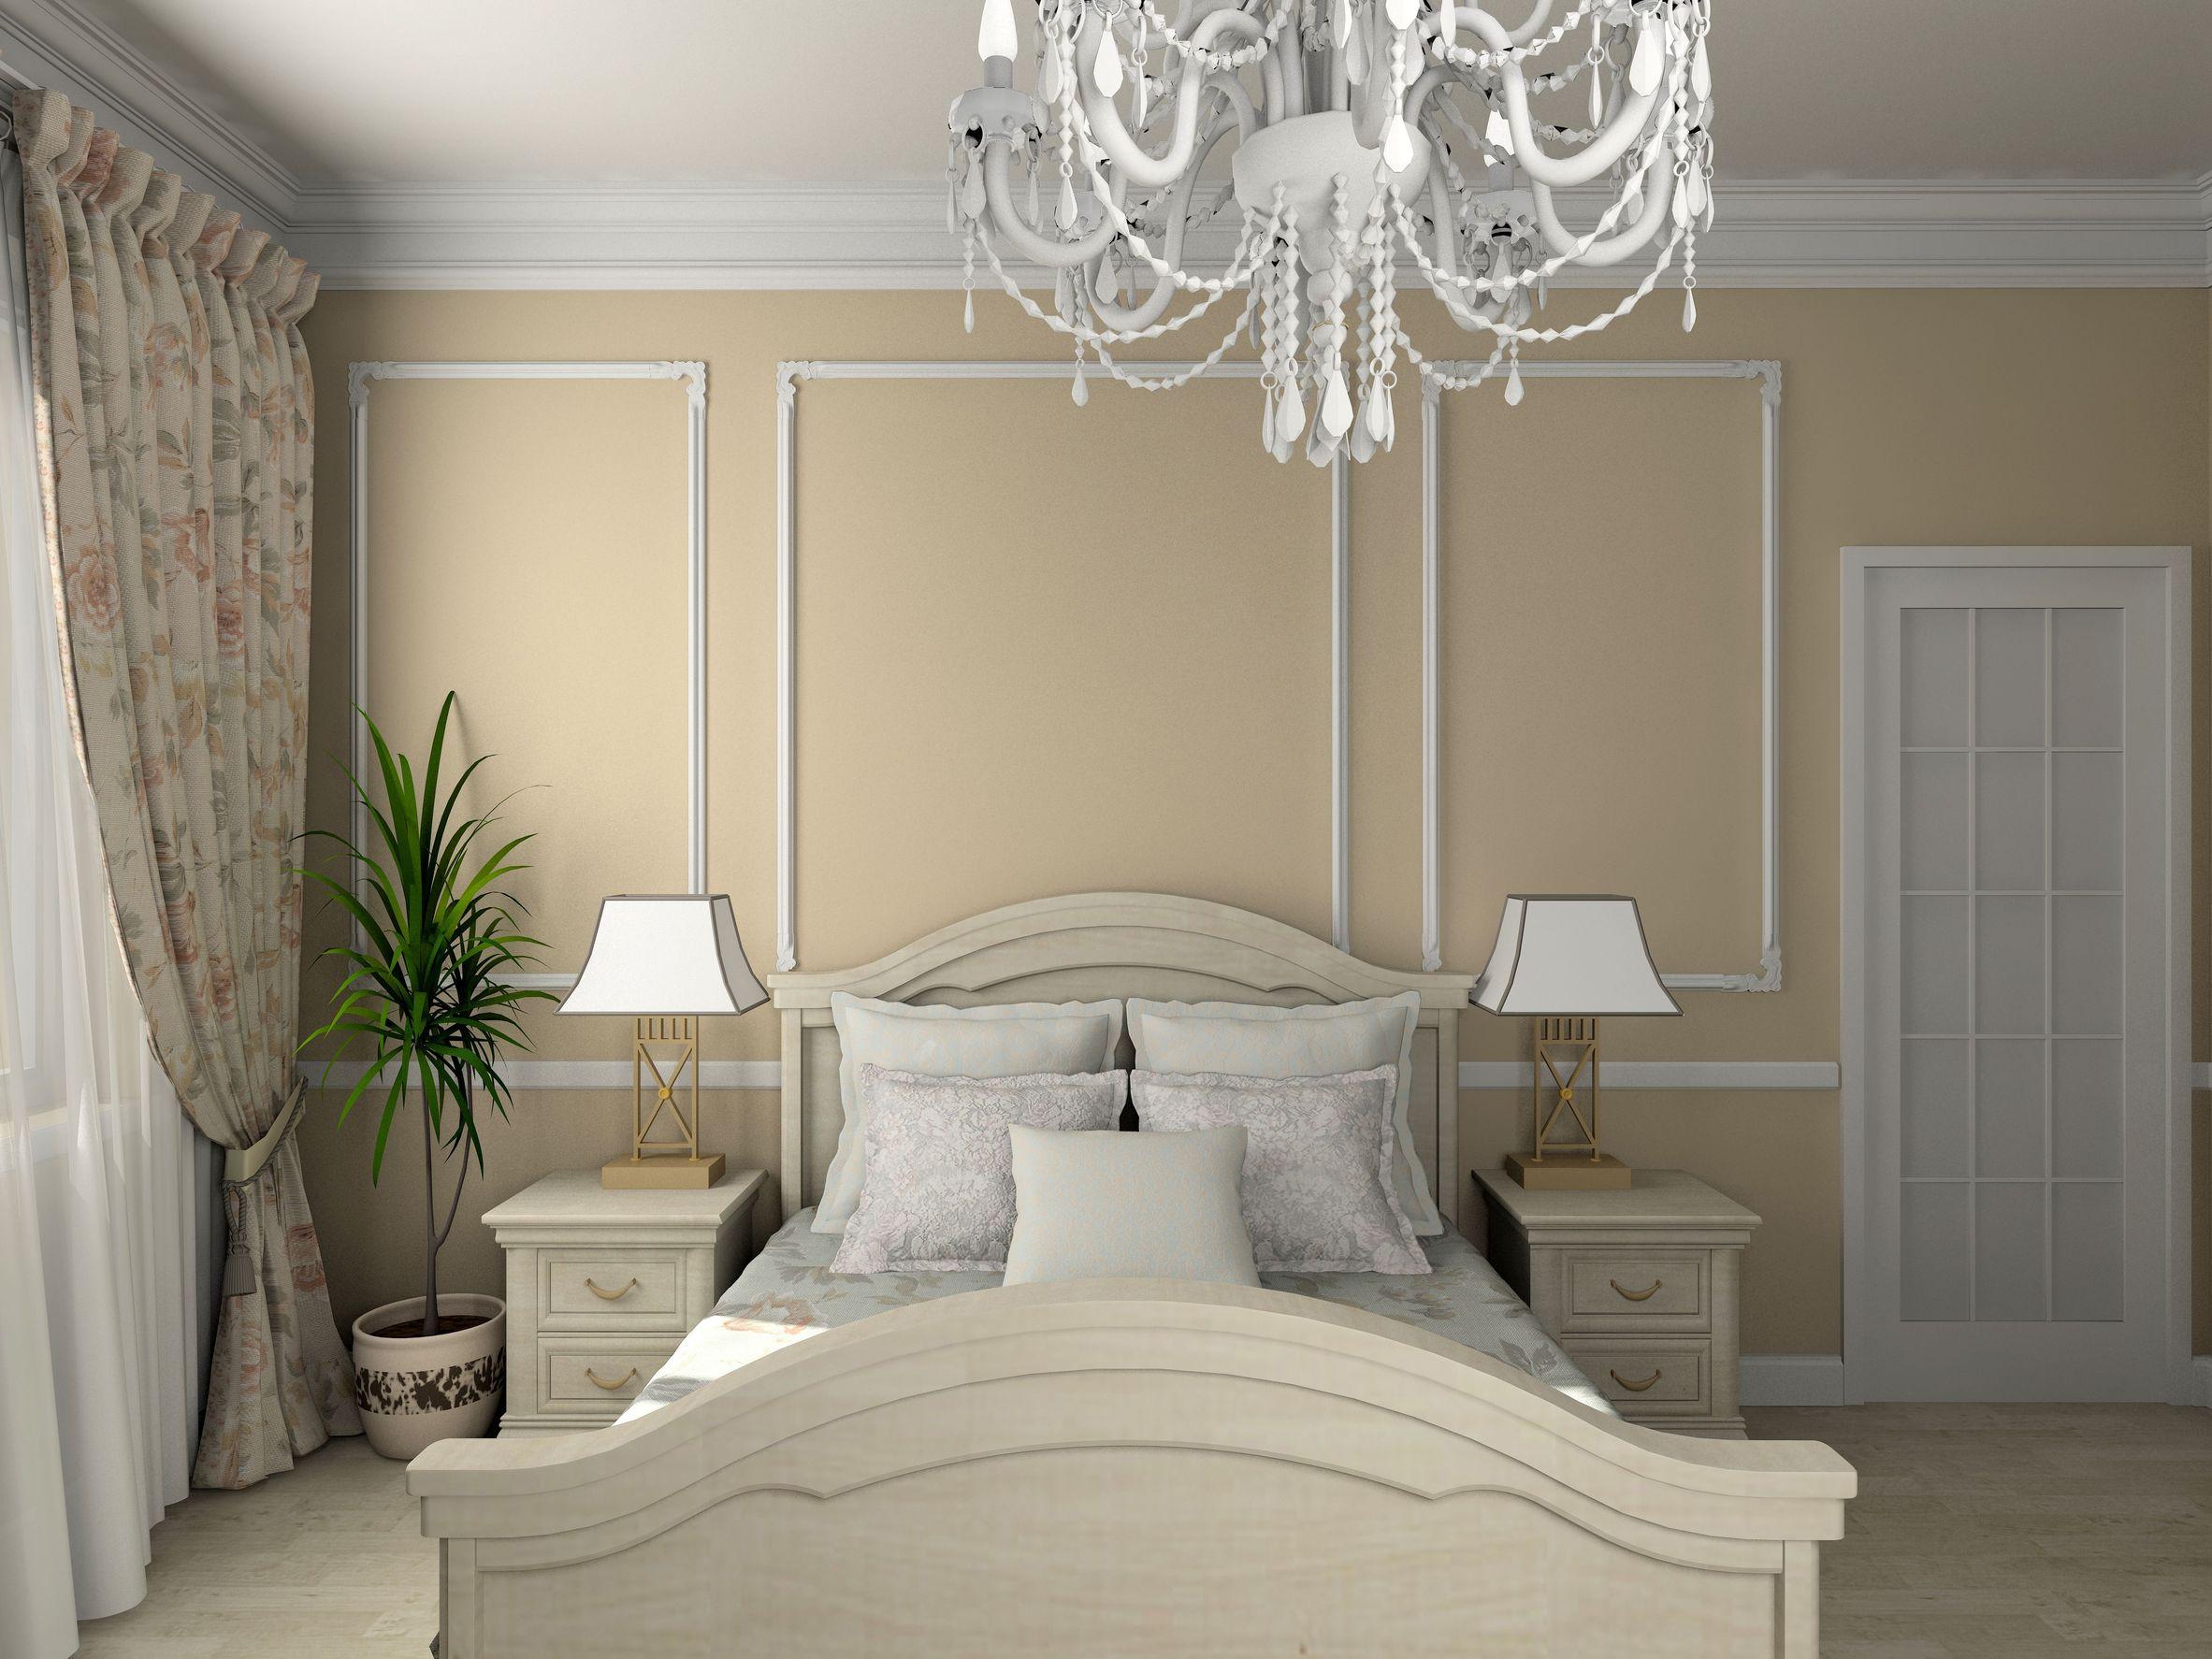 chandelier for small bedroom descargas mundiales com bedroom chandelier ideas bedroom chandelier ideas fantastical chandelier for bedroom